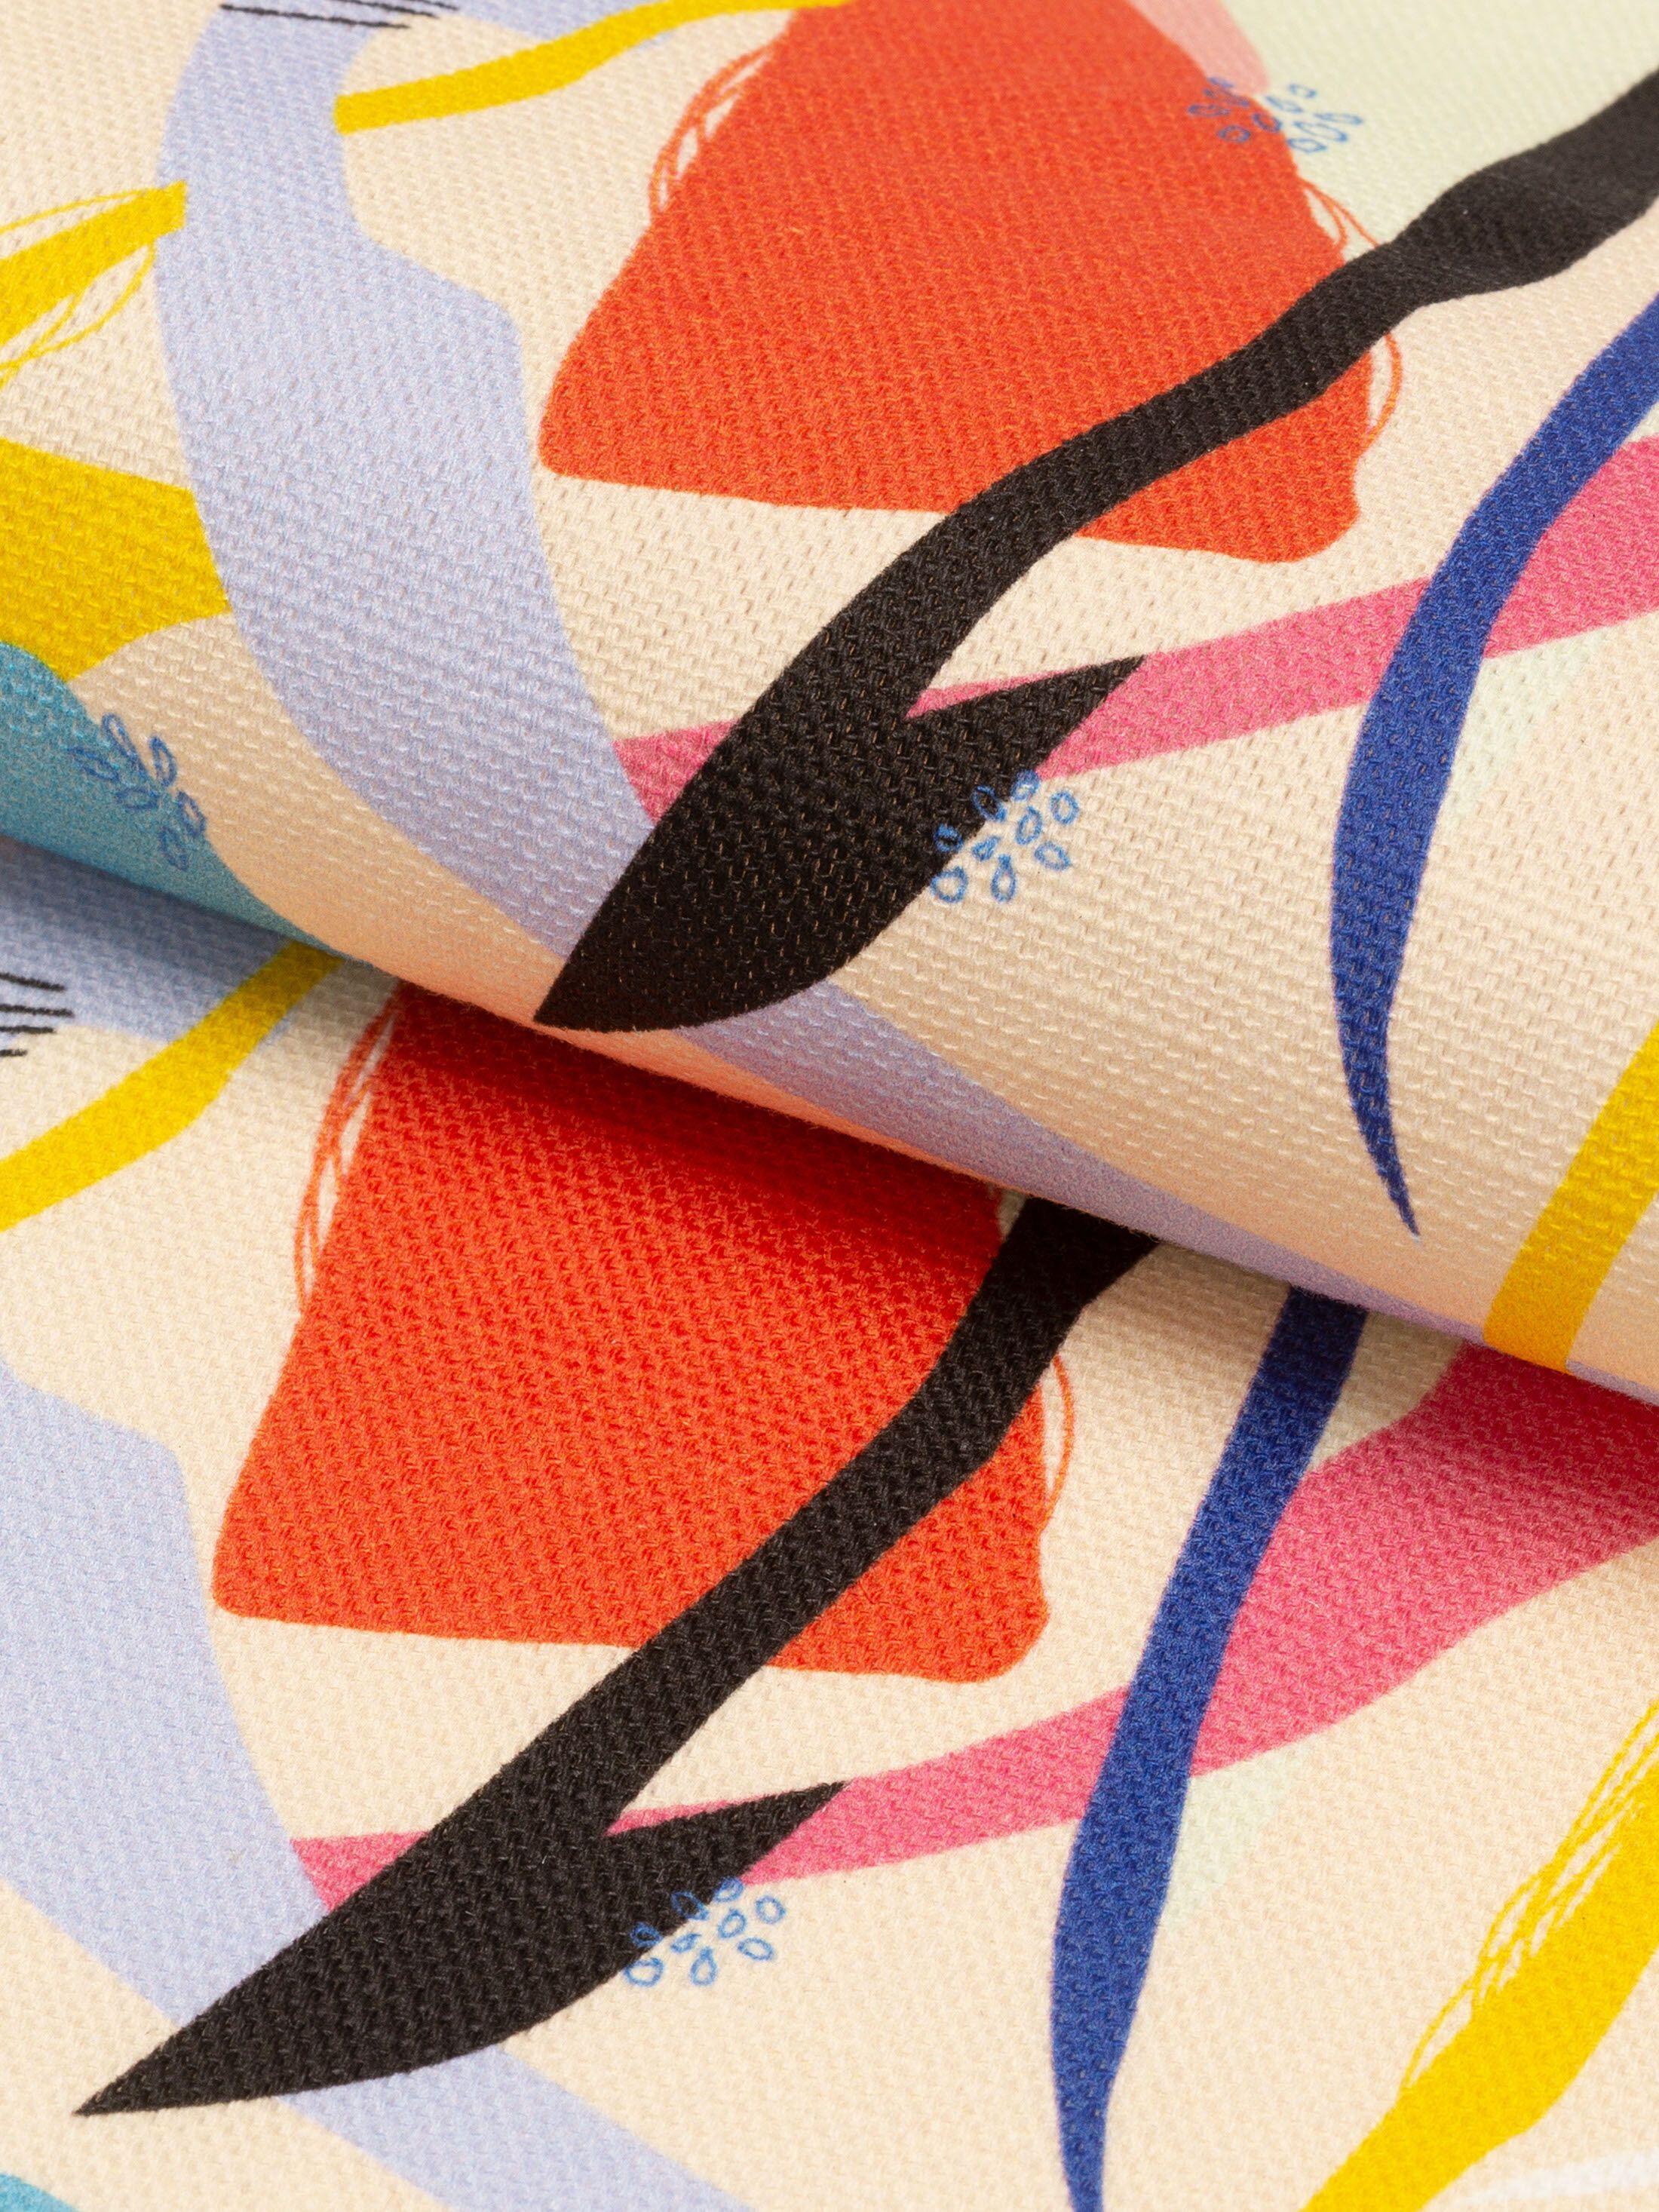 custom Cotton Linen Blend fabric printing